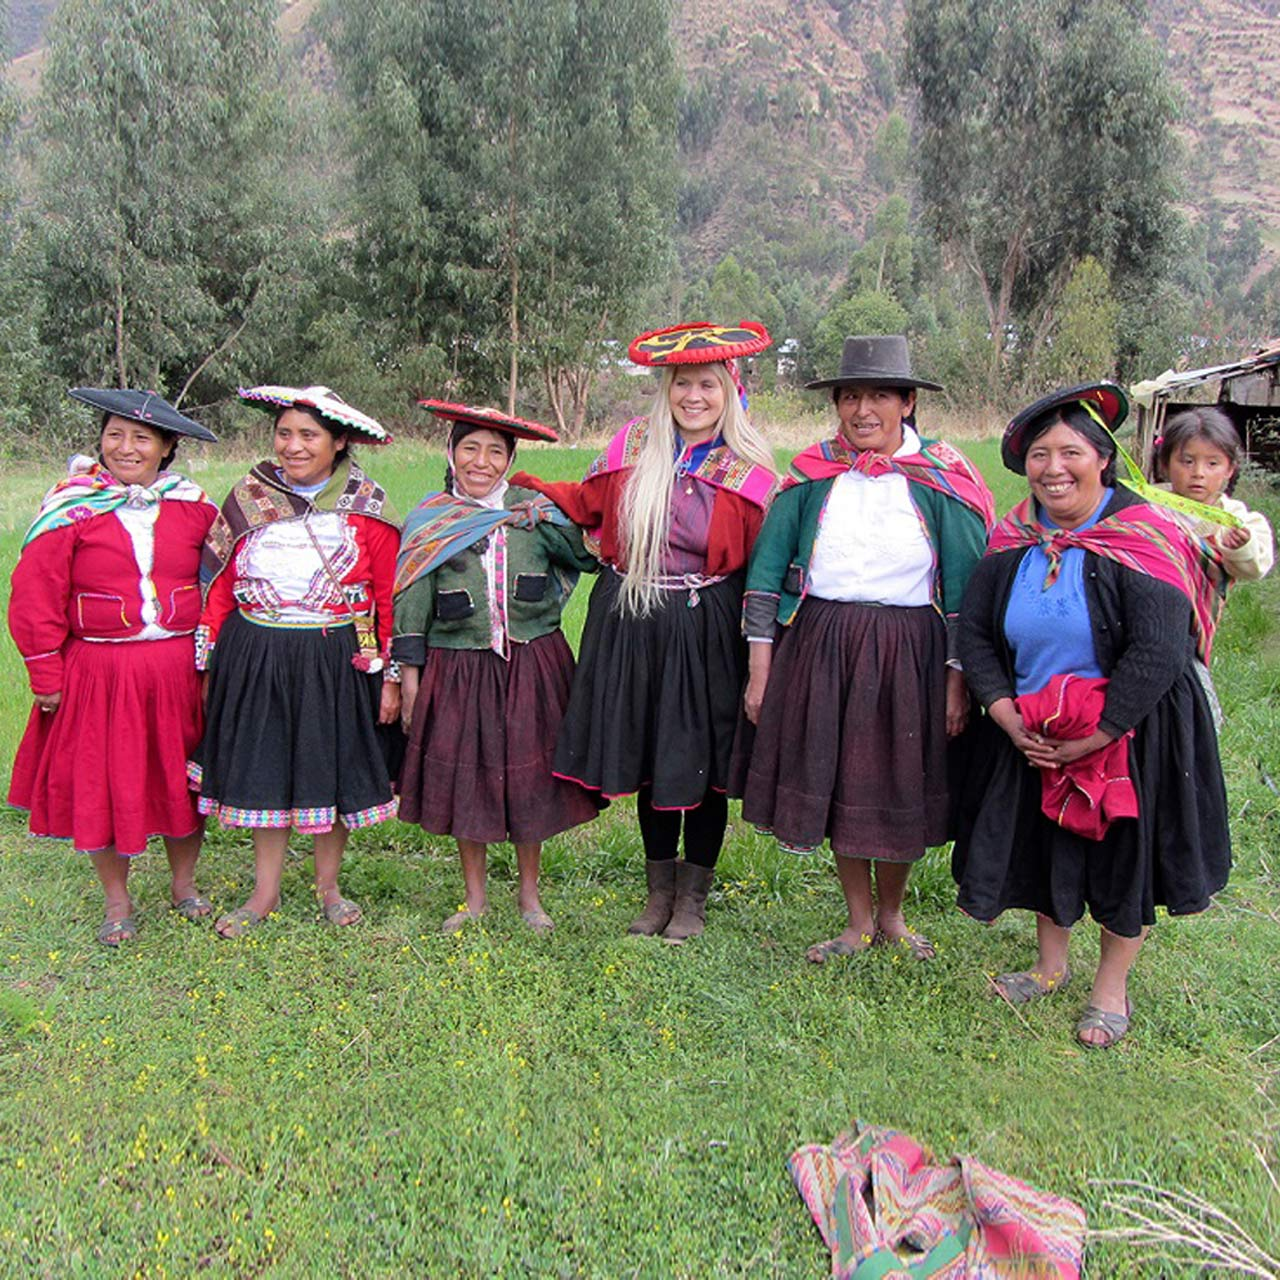 ivana helsinki peruvian